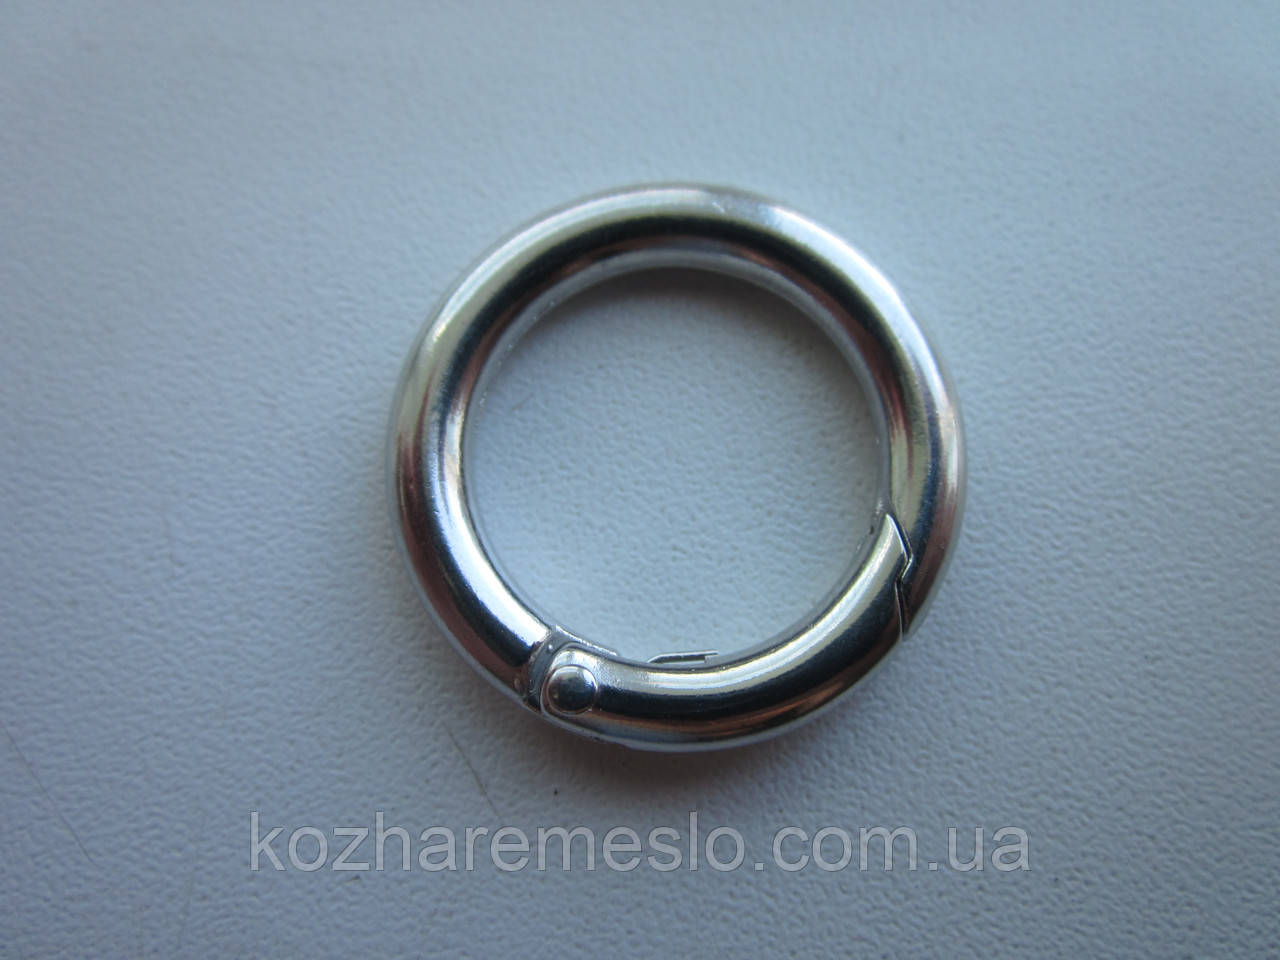 Кольцо - карабин 20 х 4 мм никель